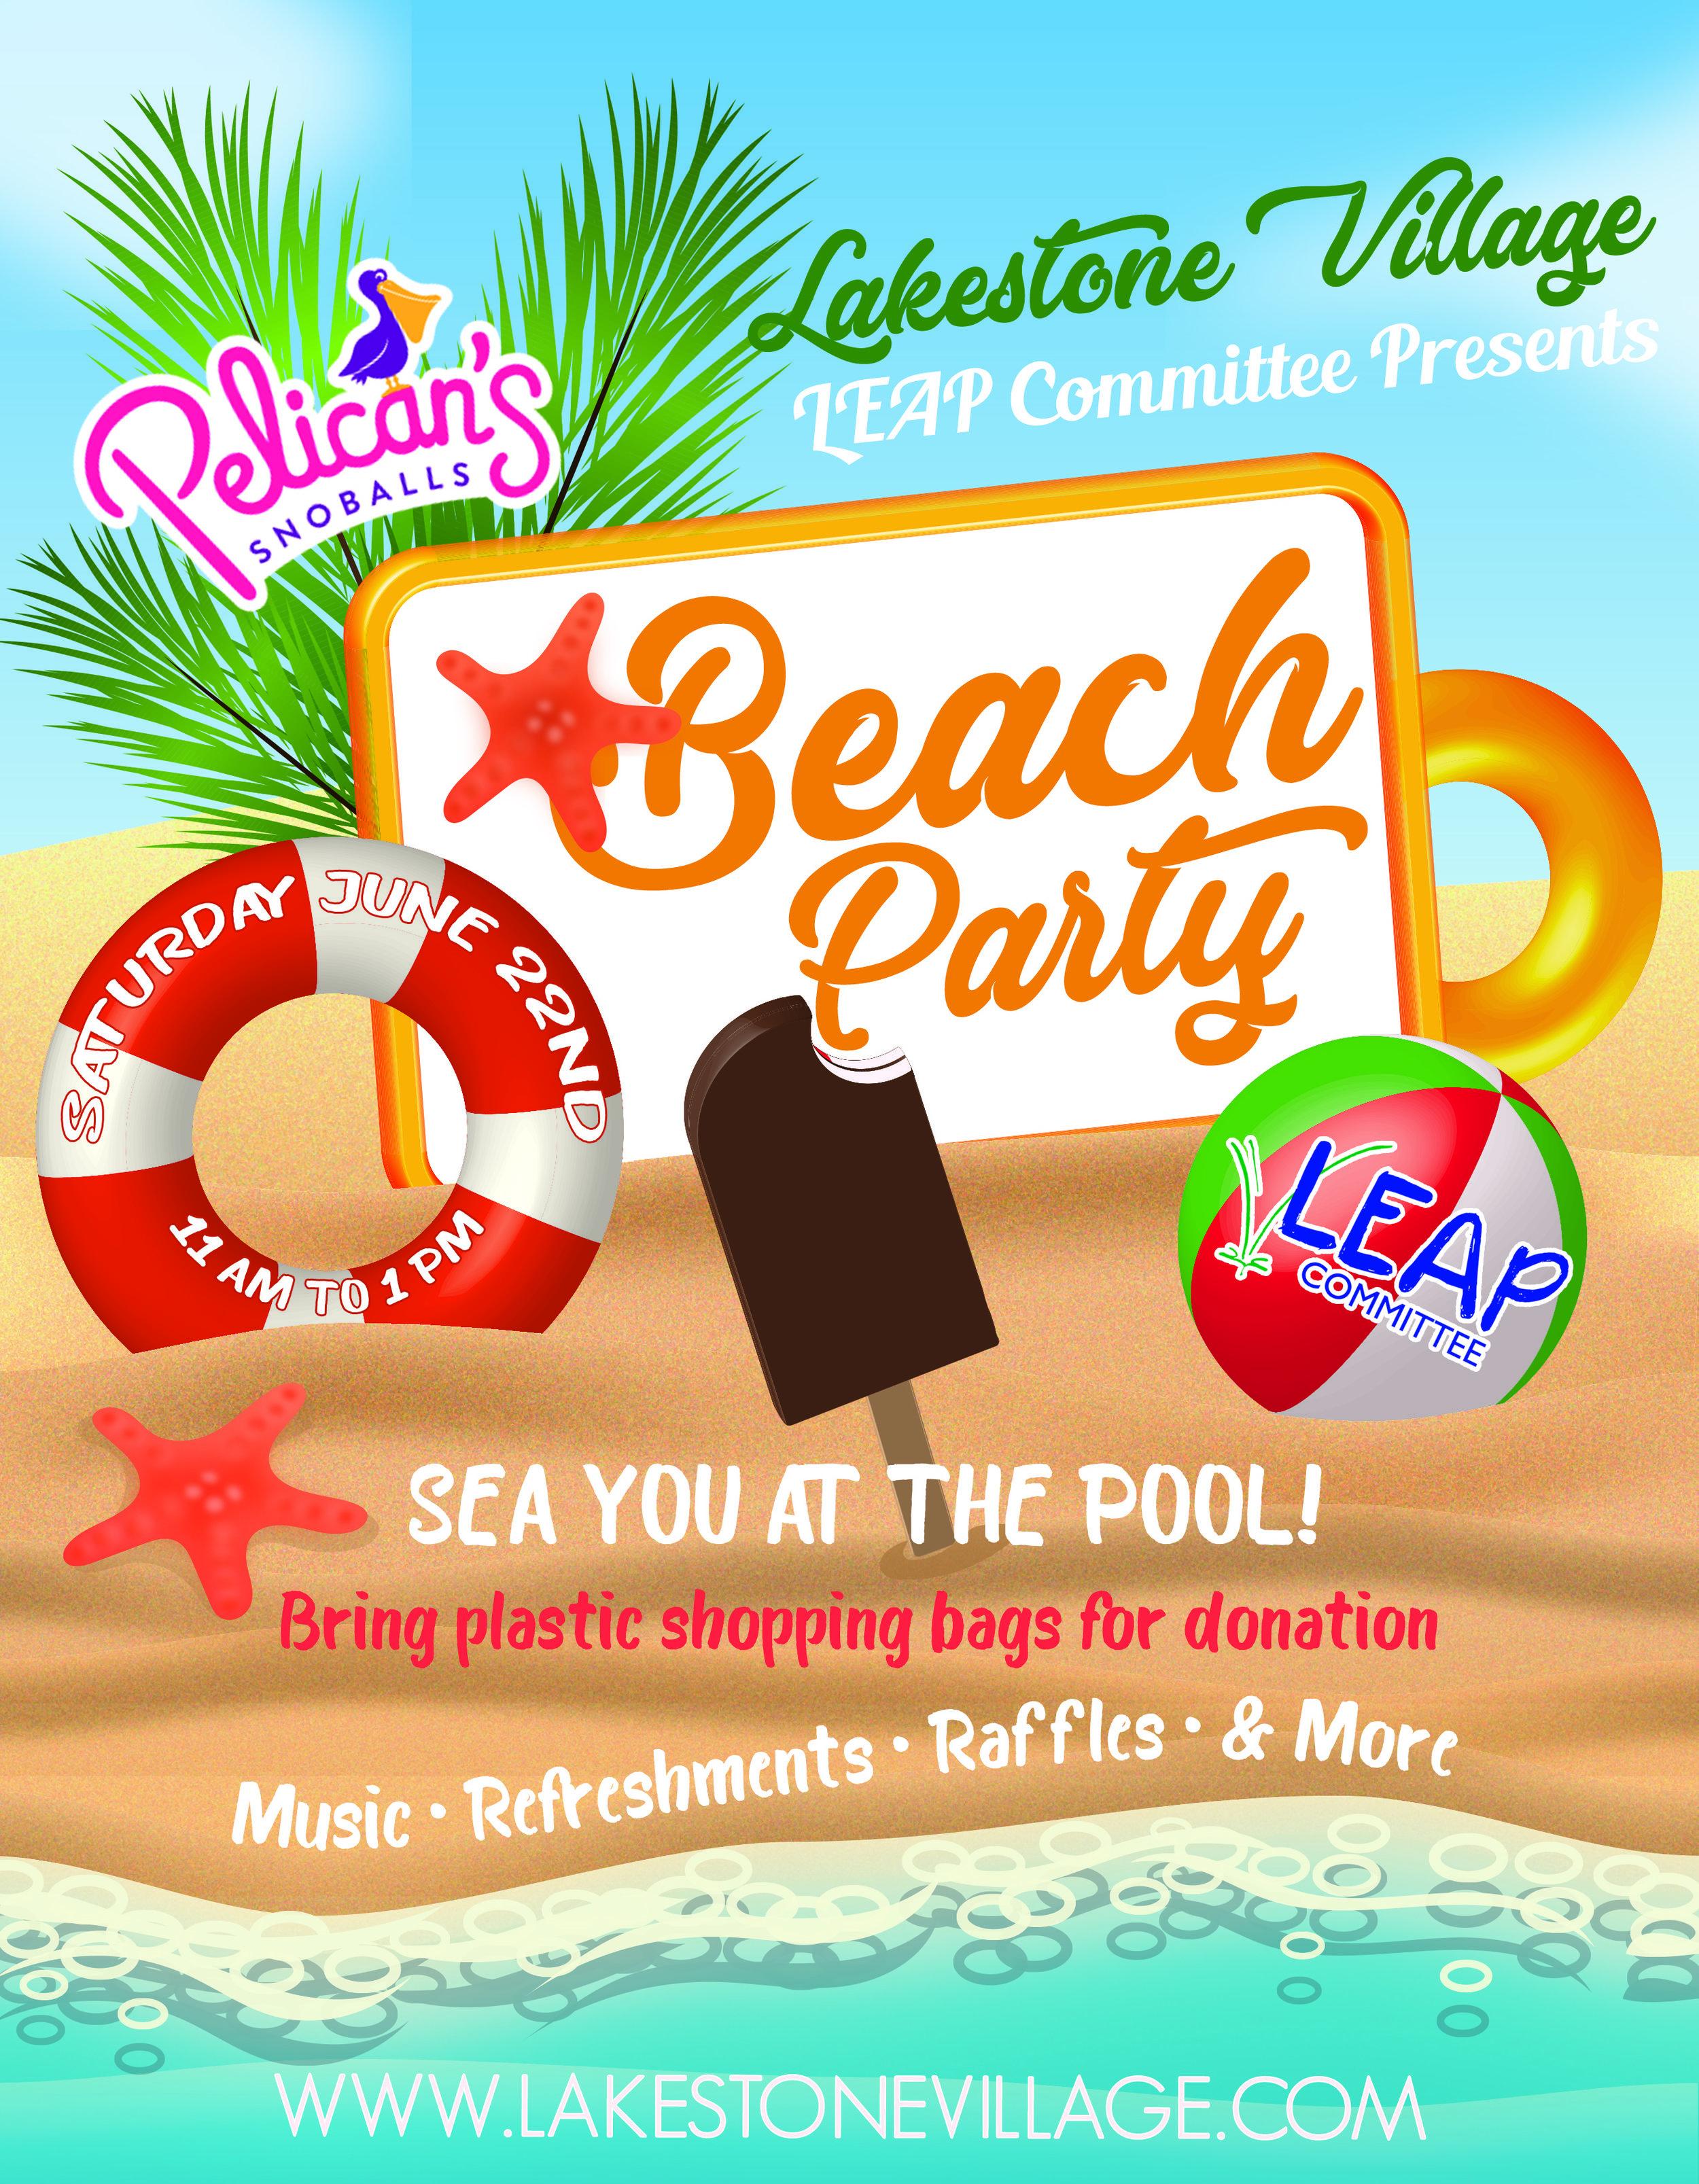 2019-06-22 Beach Pool Party LEAP.jpg